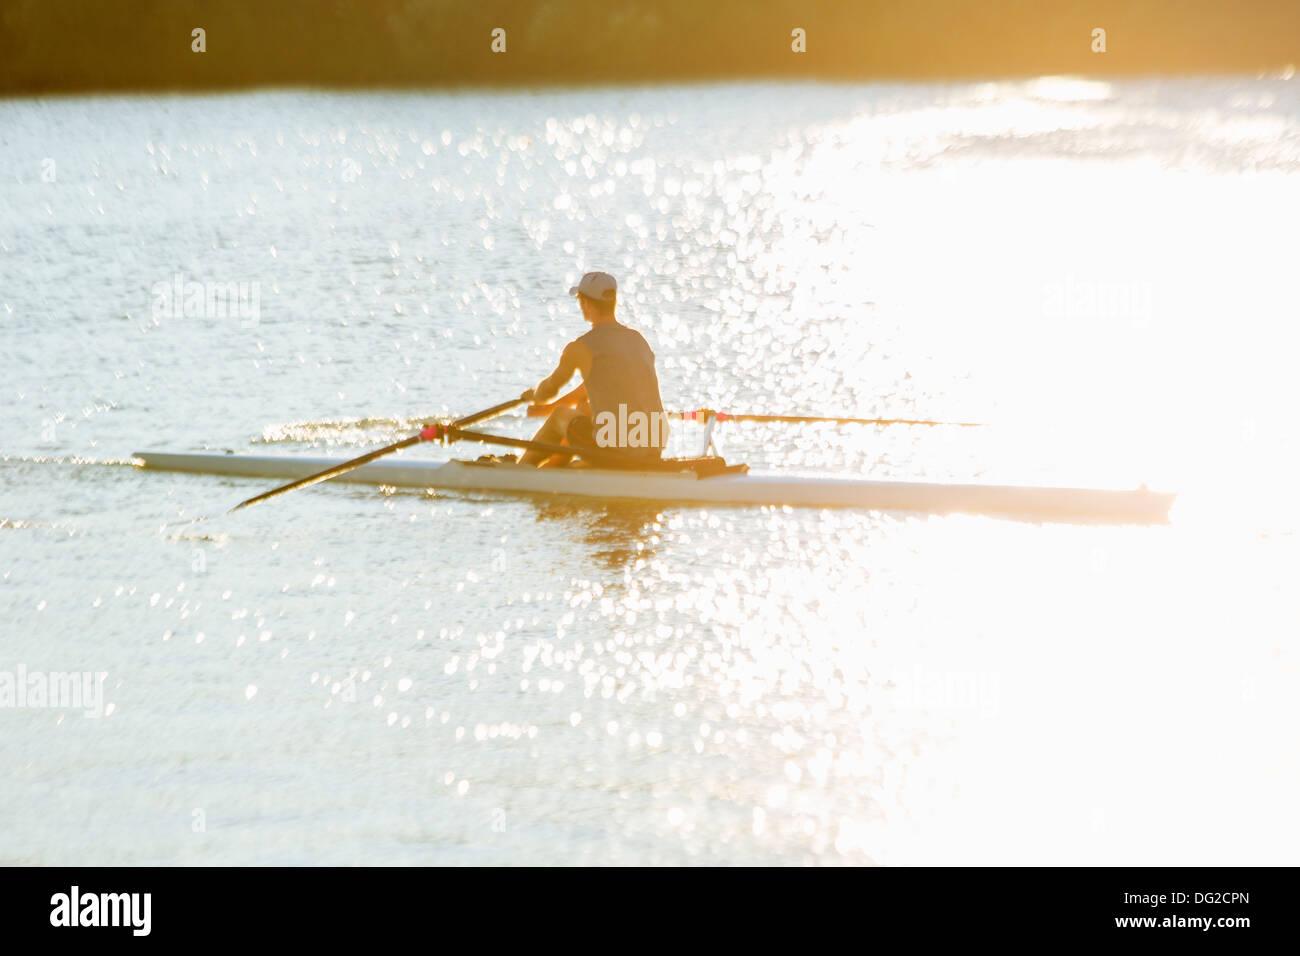 Canada,Ontario,Saint Catharines, Royal Henley Regatta, singles rowing - Stock Image